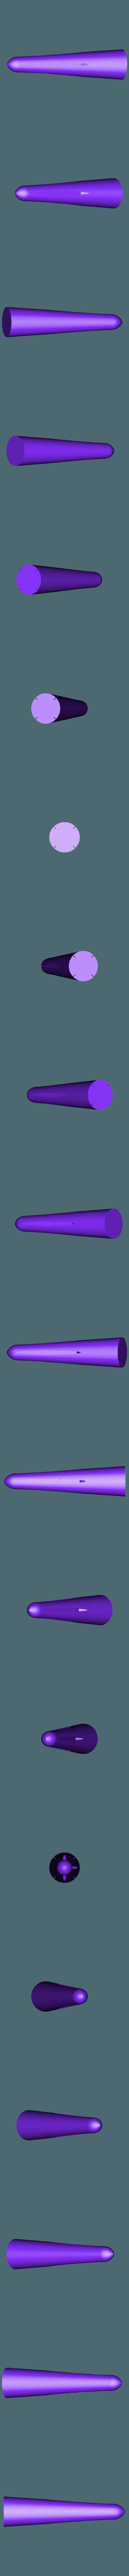 Rear_Fuselage.stl Download free STL file Flyer Mk. 1 • 3D printing object, billbo1958